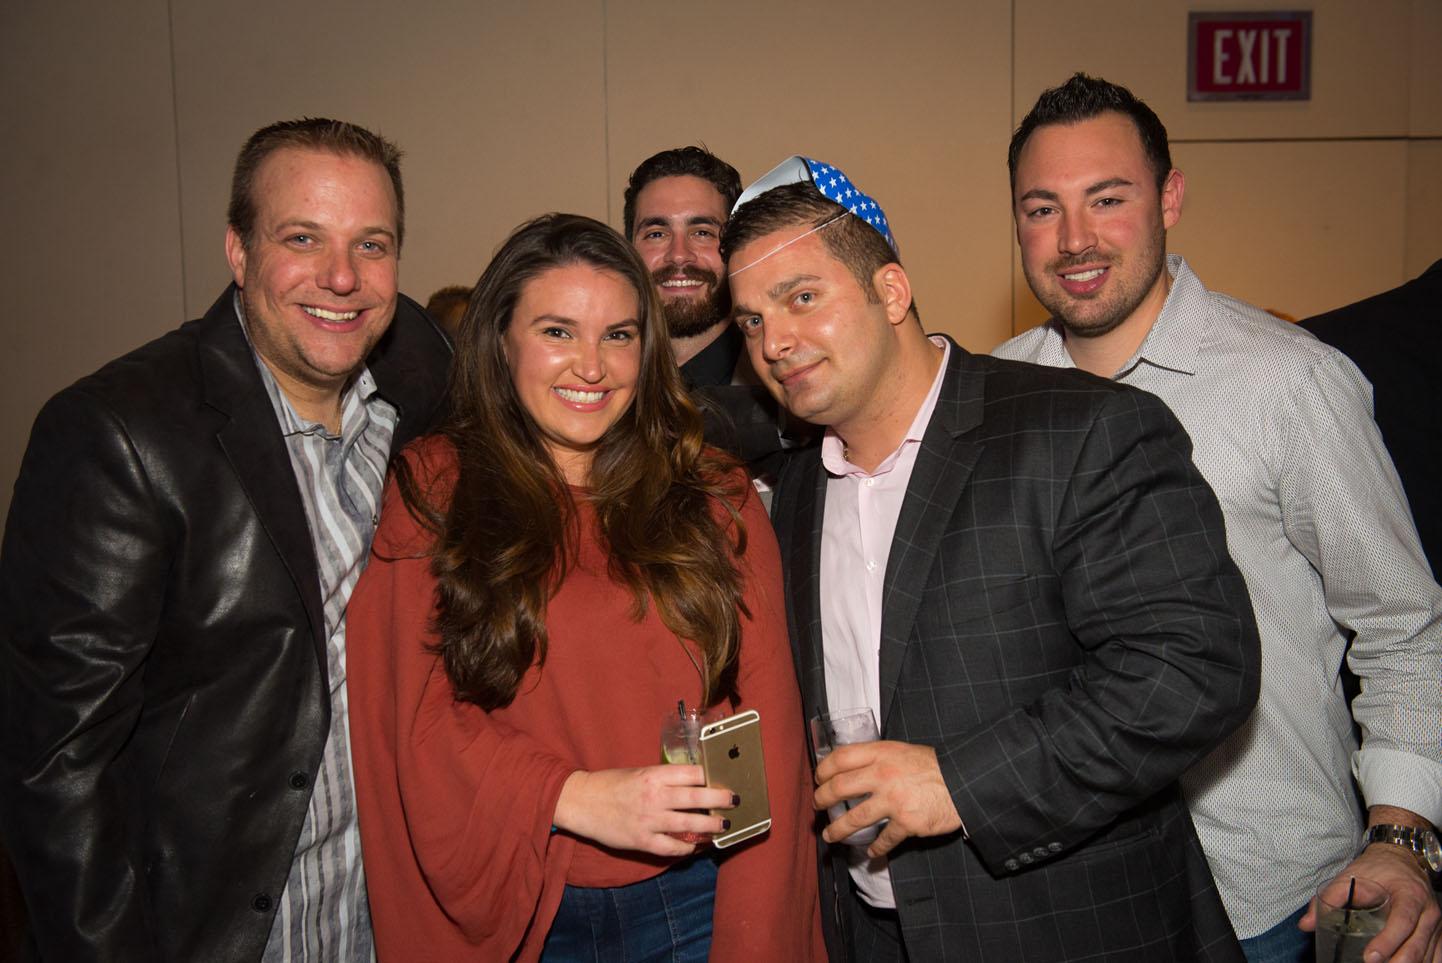 2015-12-09 ReMax Corpoarte Event - The Borgata - Atlantic City NJ - Photo Sesh - 2015-5160.jpg